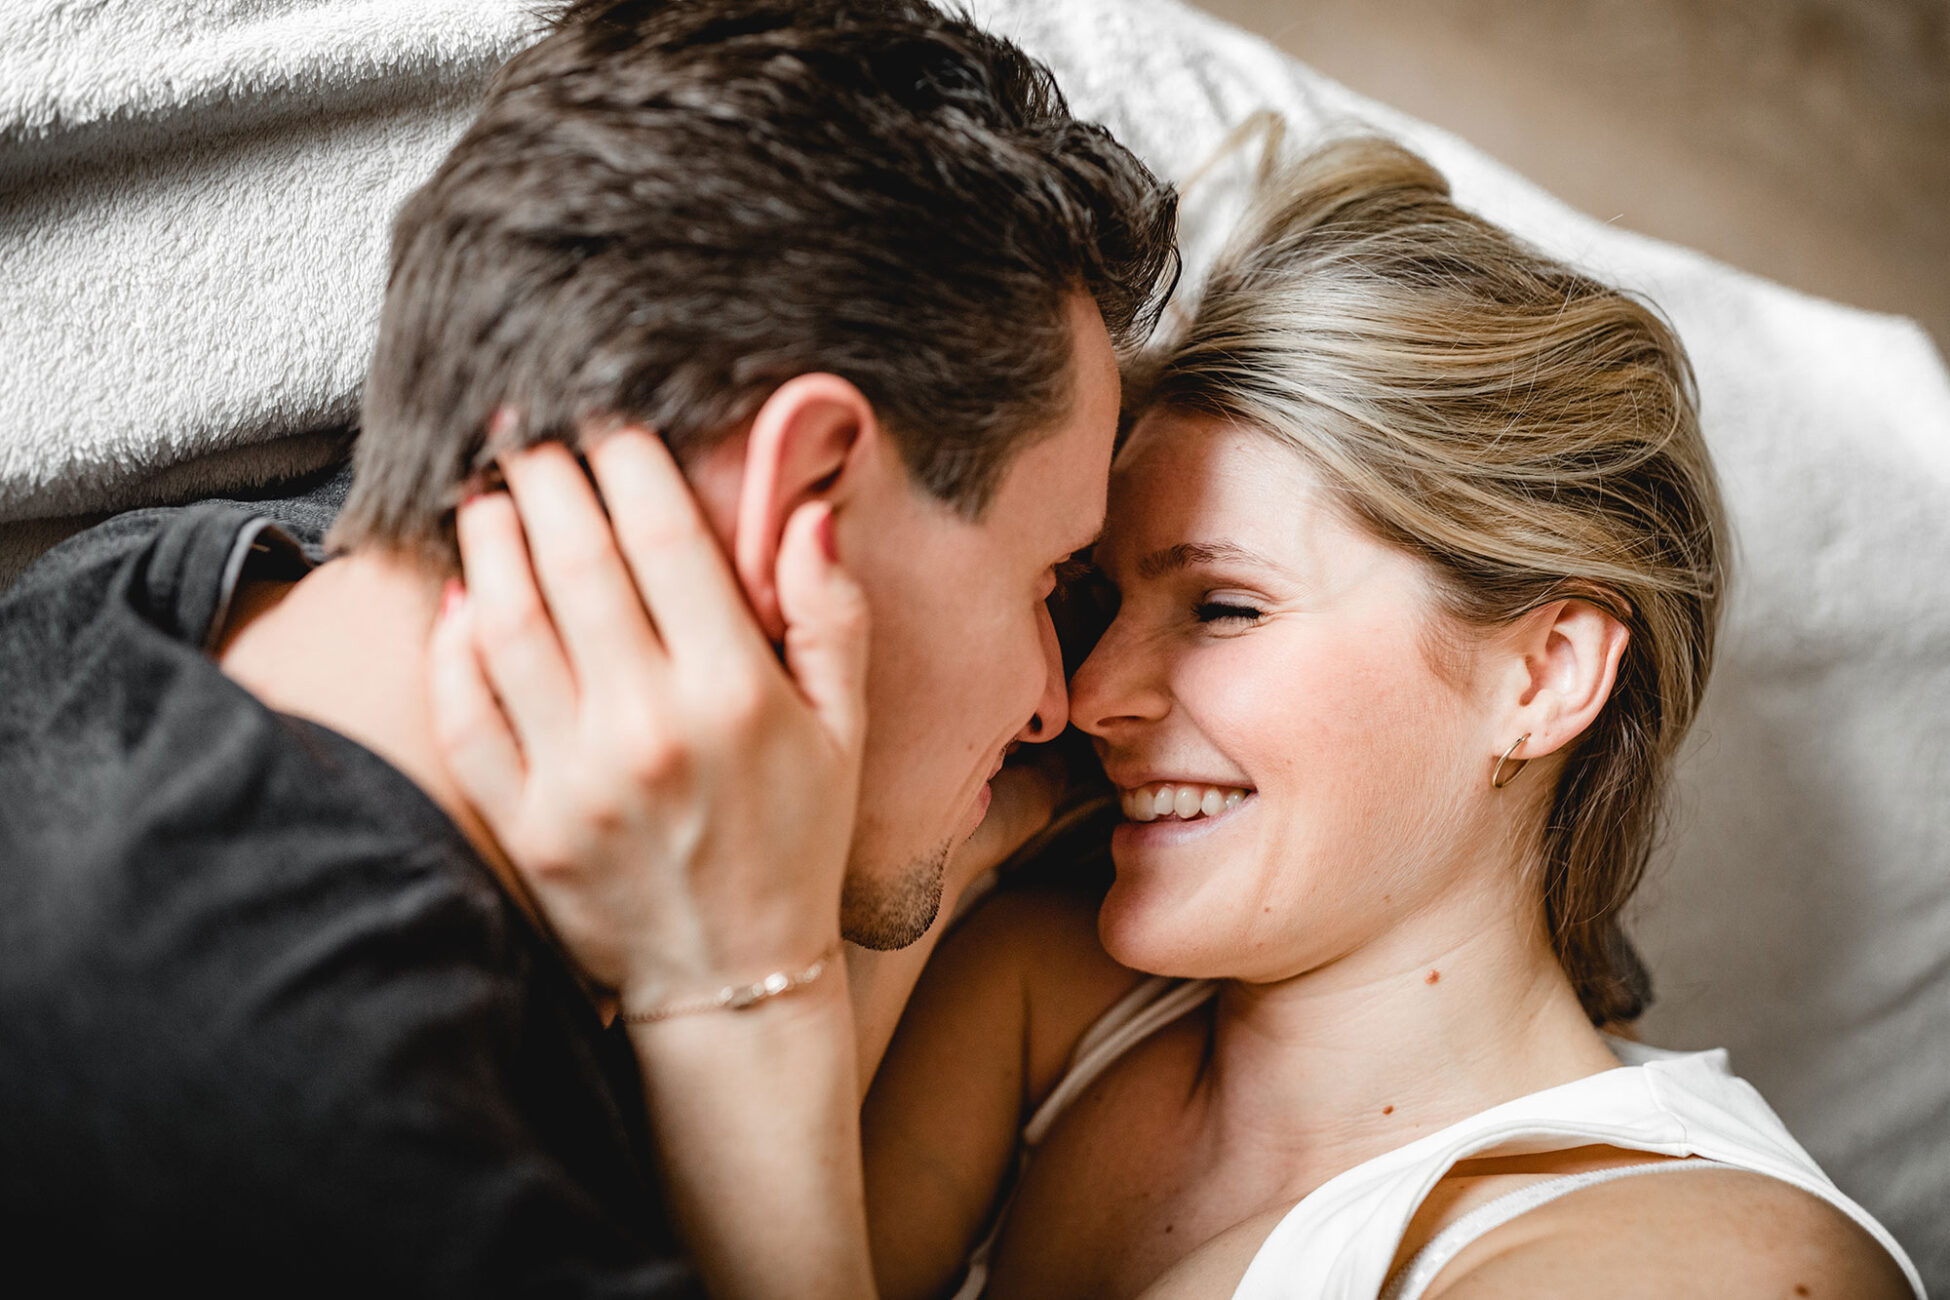 Steffi Mayer Familienfotografie Hamburg Paar Couple Lovestorie